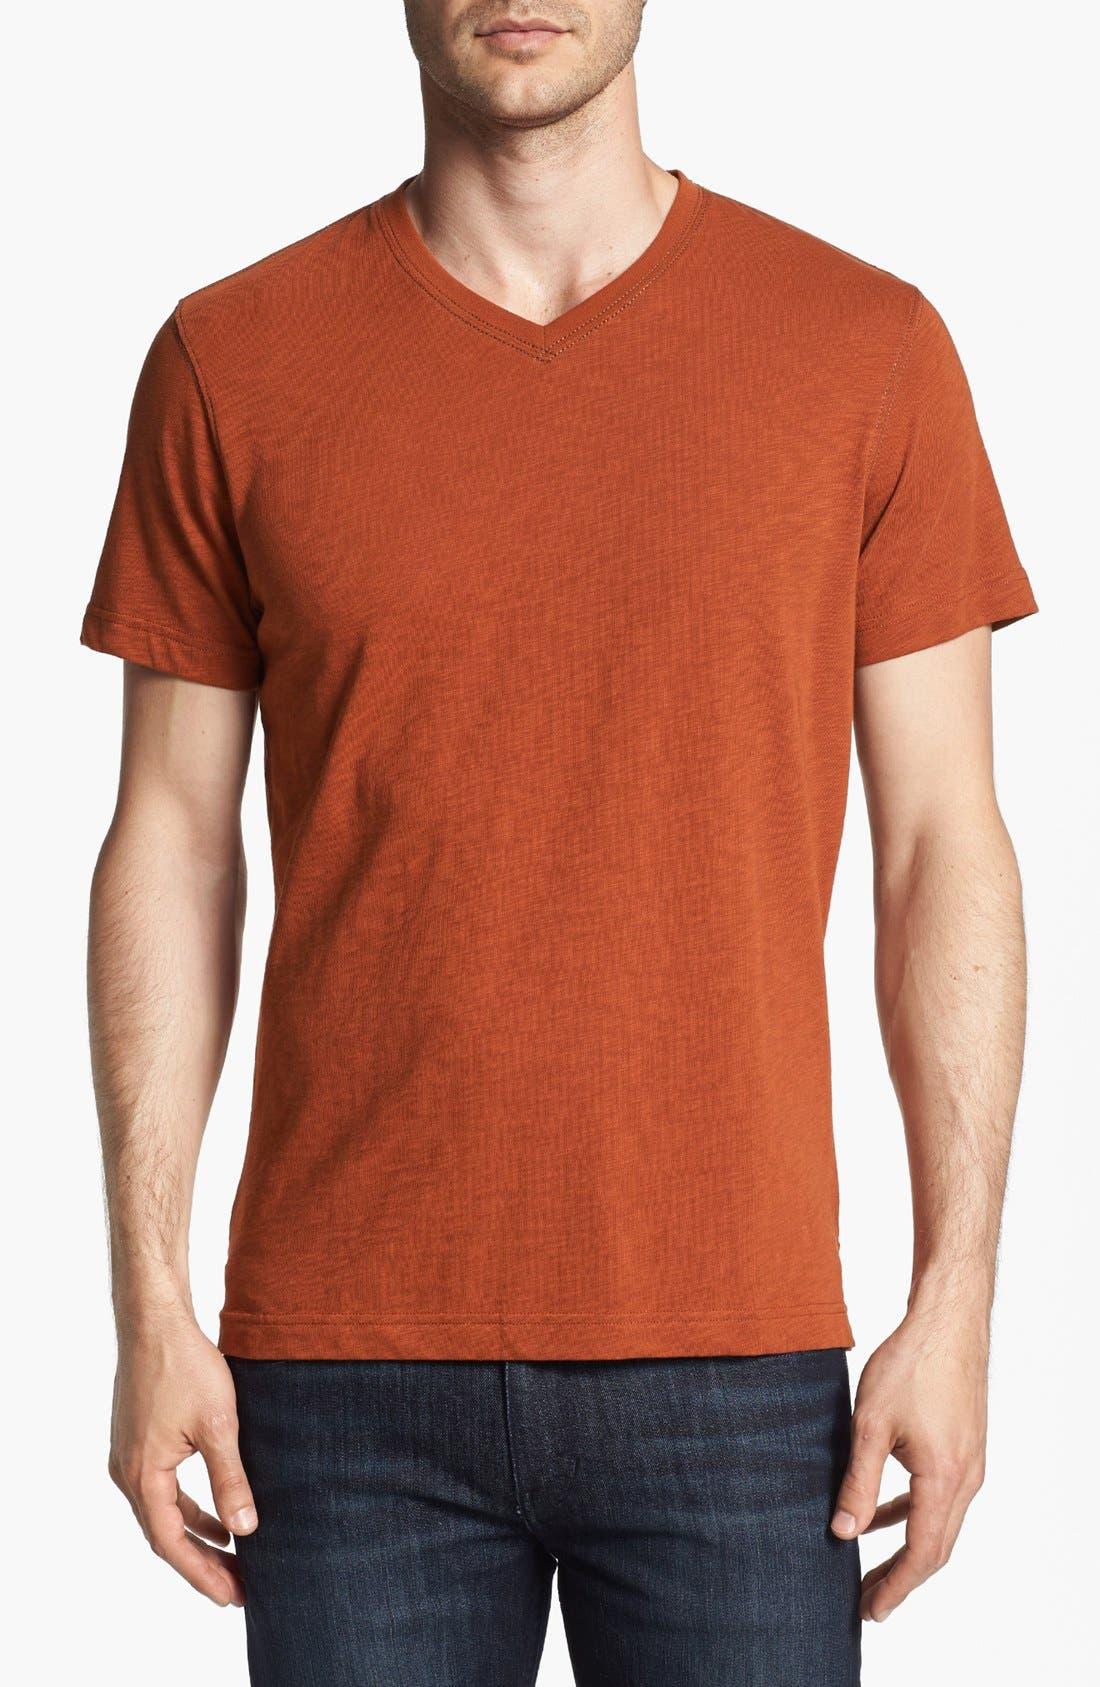 Main Image - Robert Barakett 'Miami' V-Neck T-Shirt